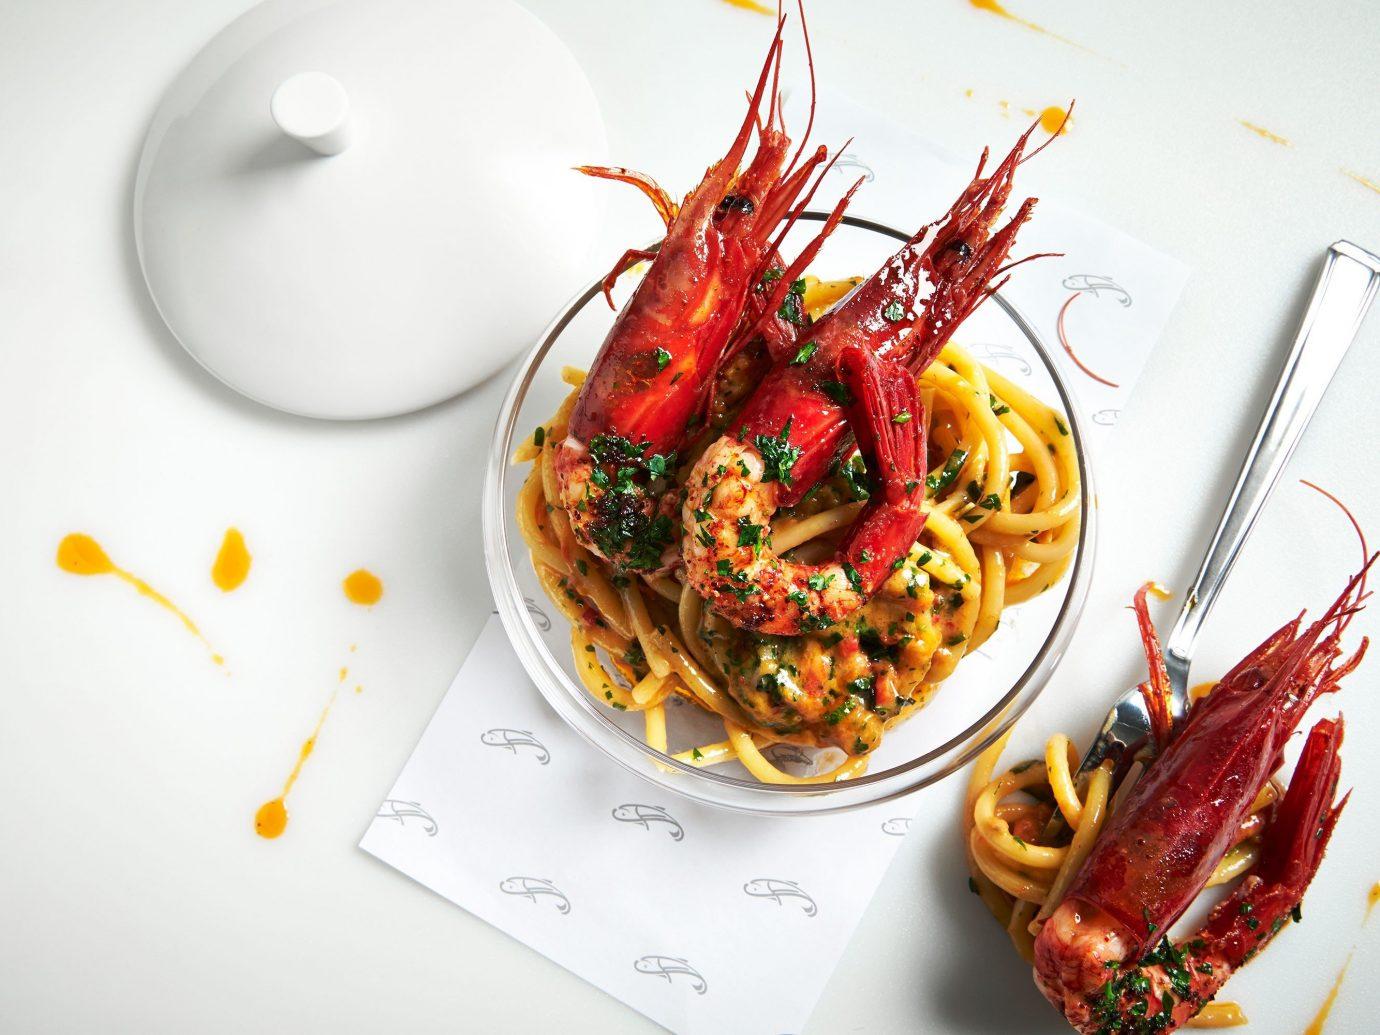 Food + Drink food plate dish cuisine meal produce spaghetti vegetable sense Seafood italian food european food crayfish arranged piece de resistance